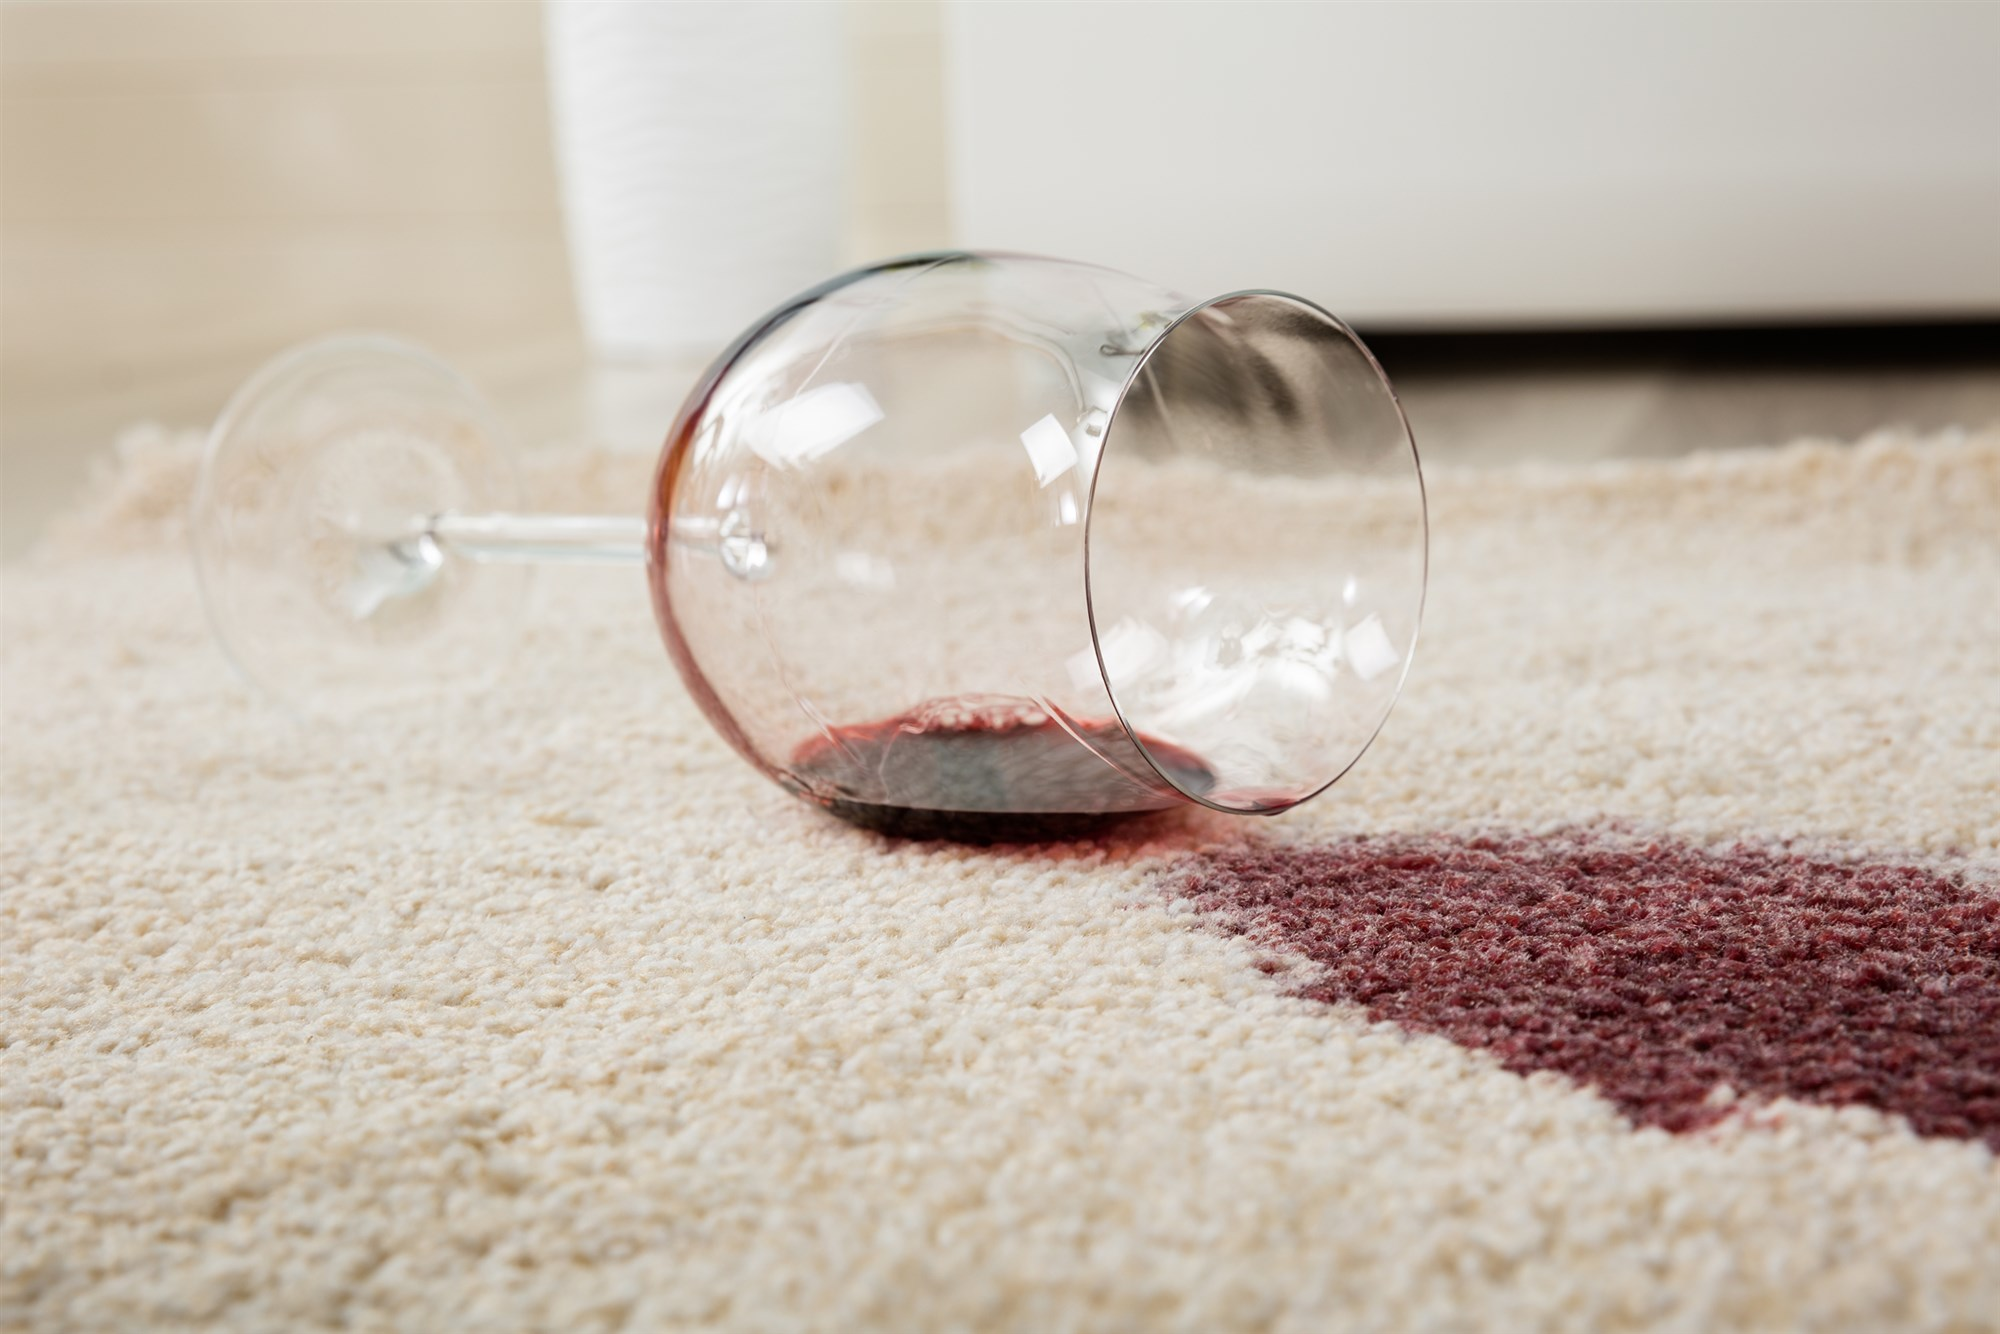 180621-wine-stain-al-1629_f363faa0d108700feac3e9763ce9a6f8.fit-2000w.jpg